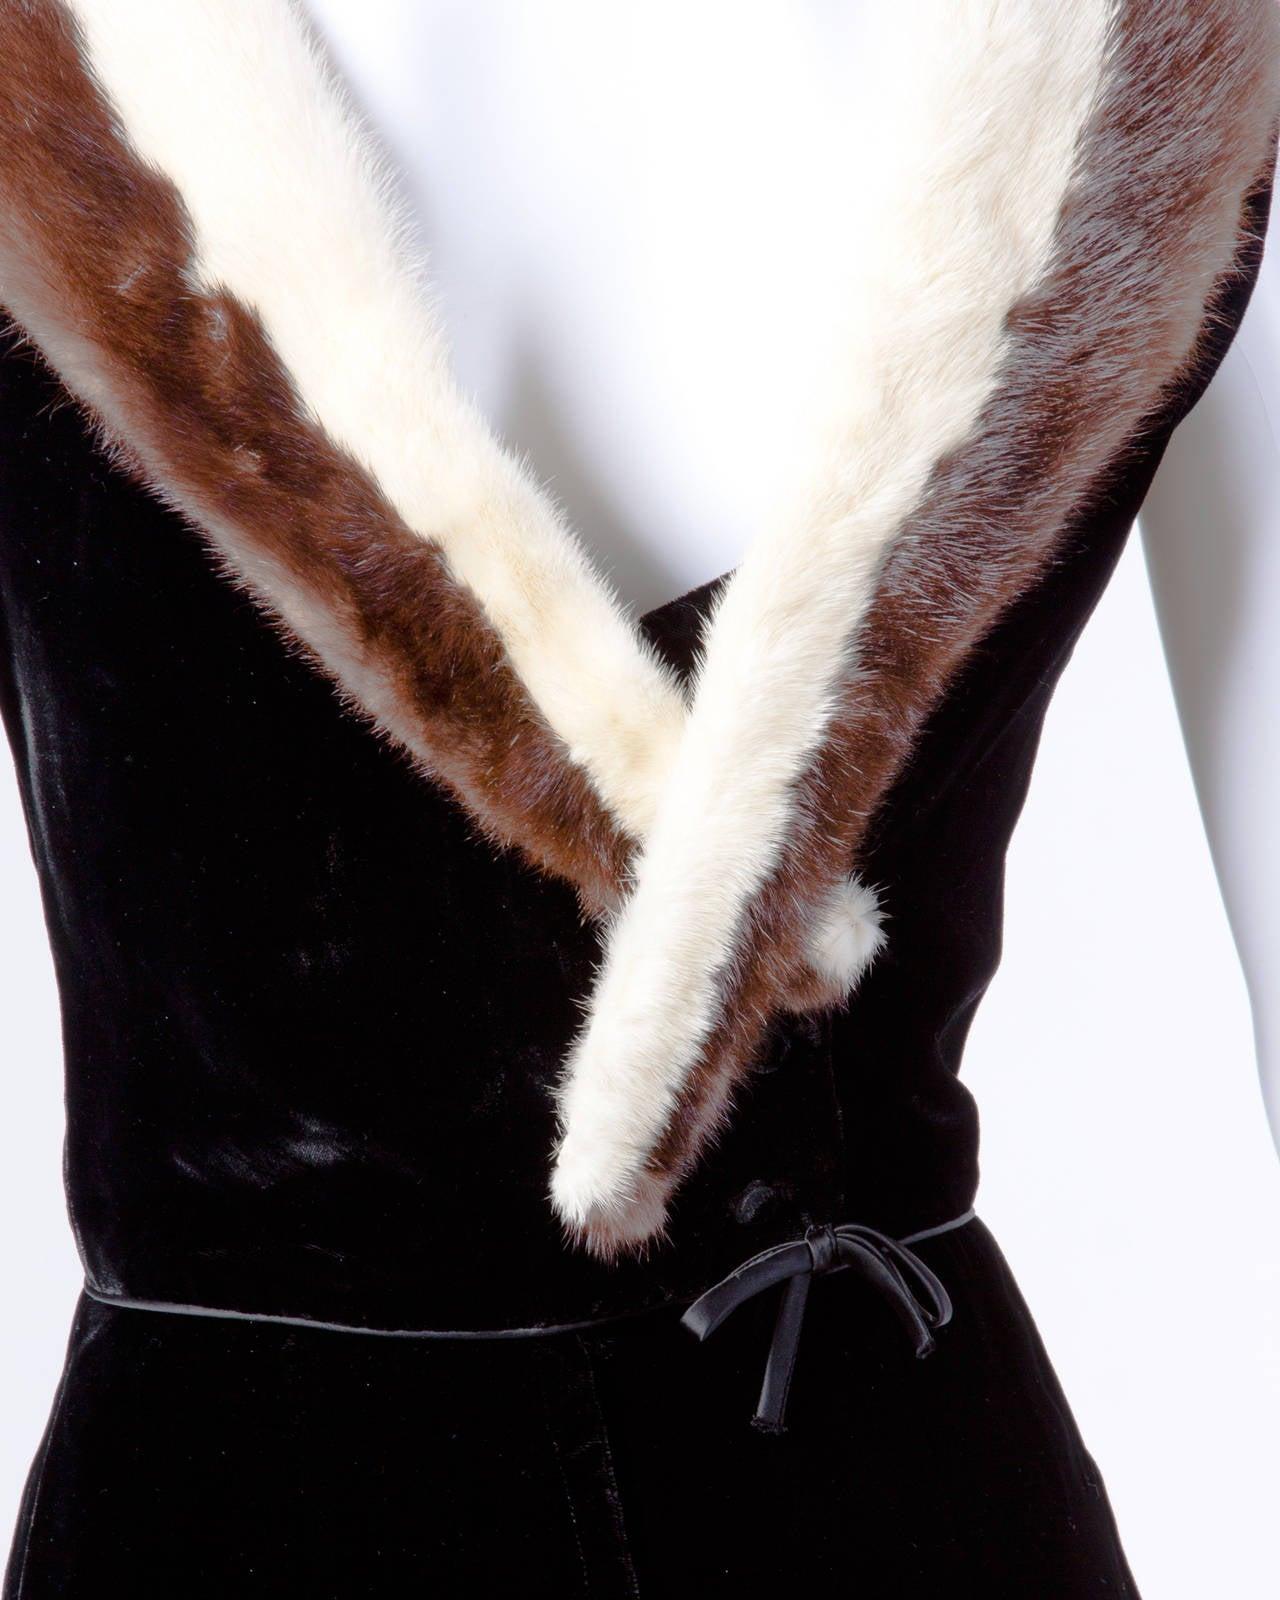 Women's Vintage 1960s 60s Black Velvet Sheath Dress with Mink Fur Trim For Sale